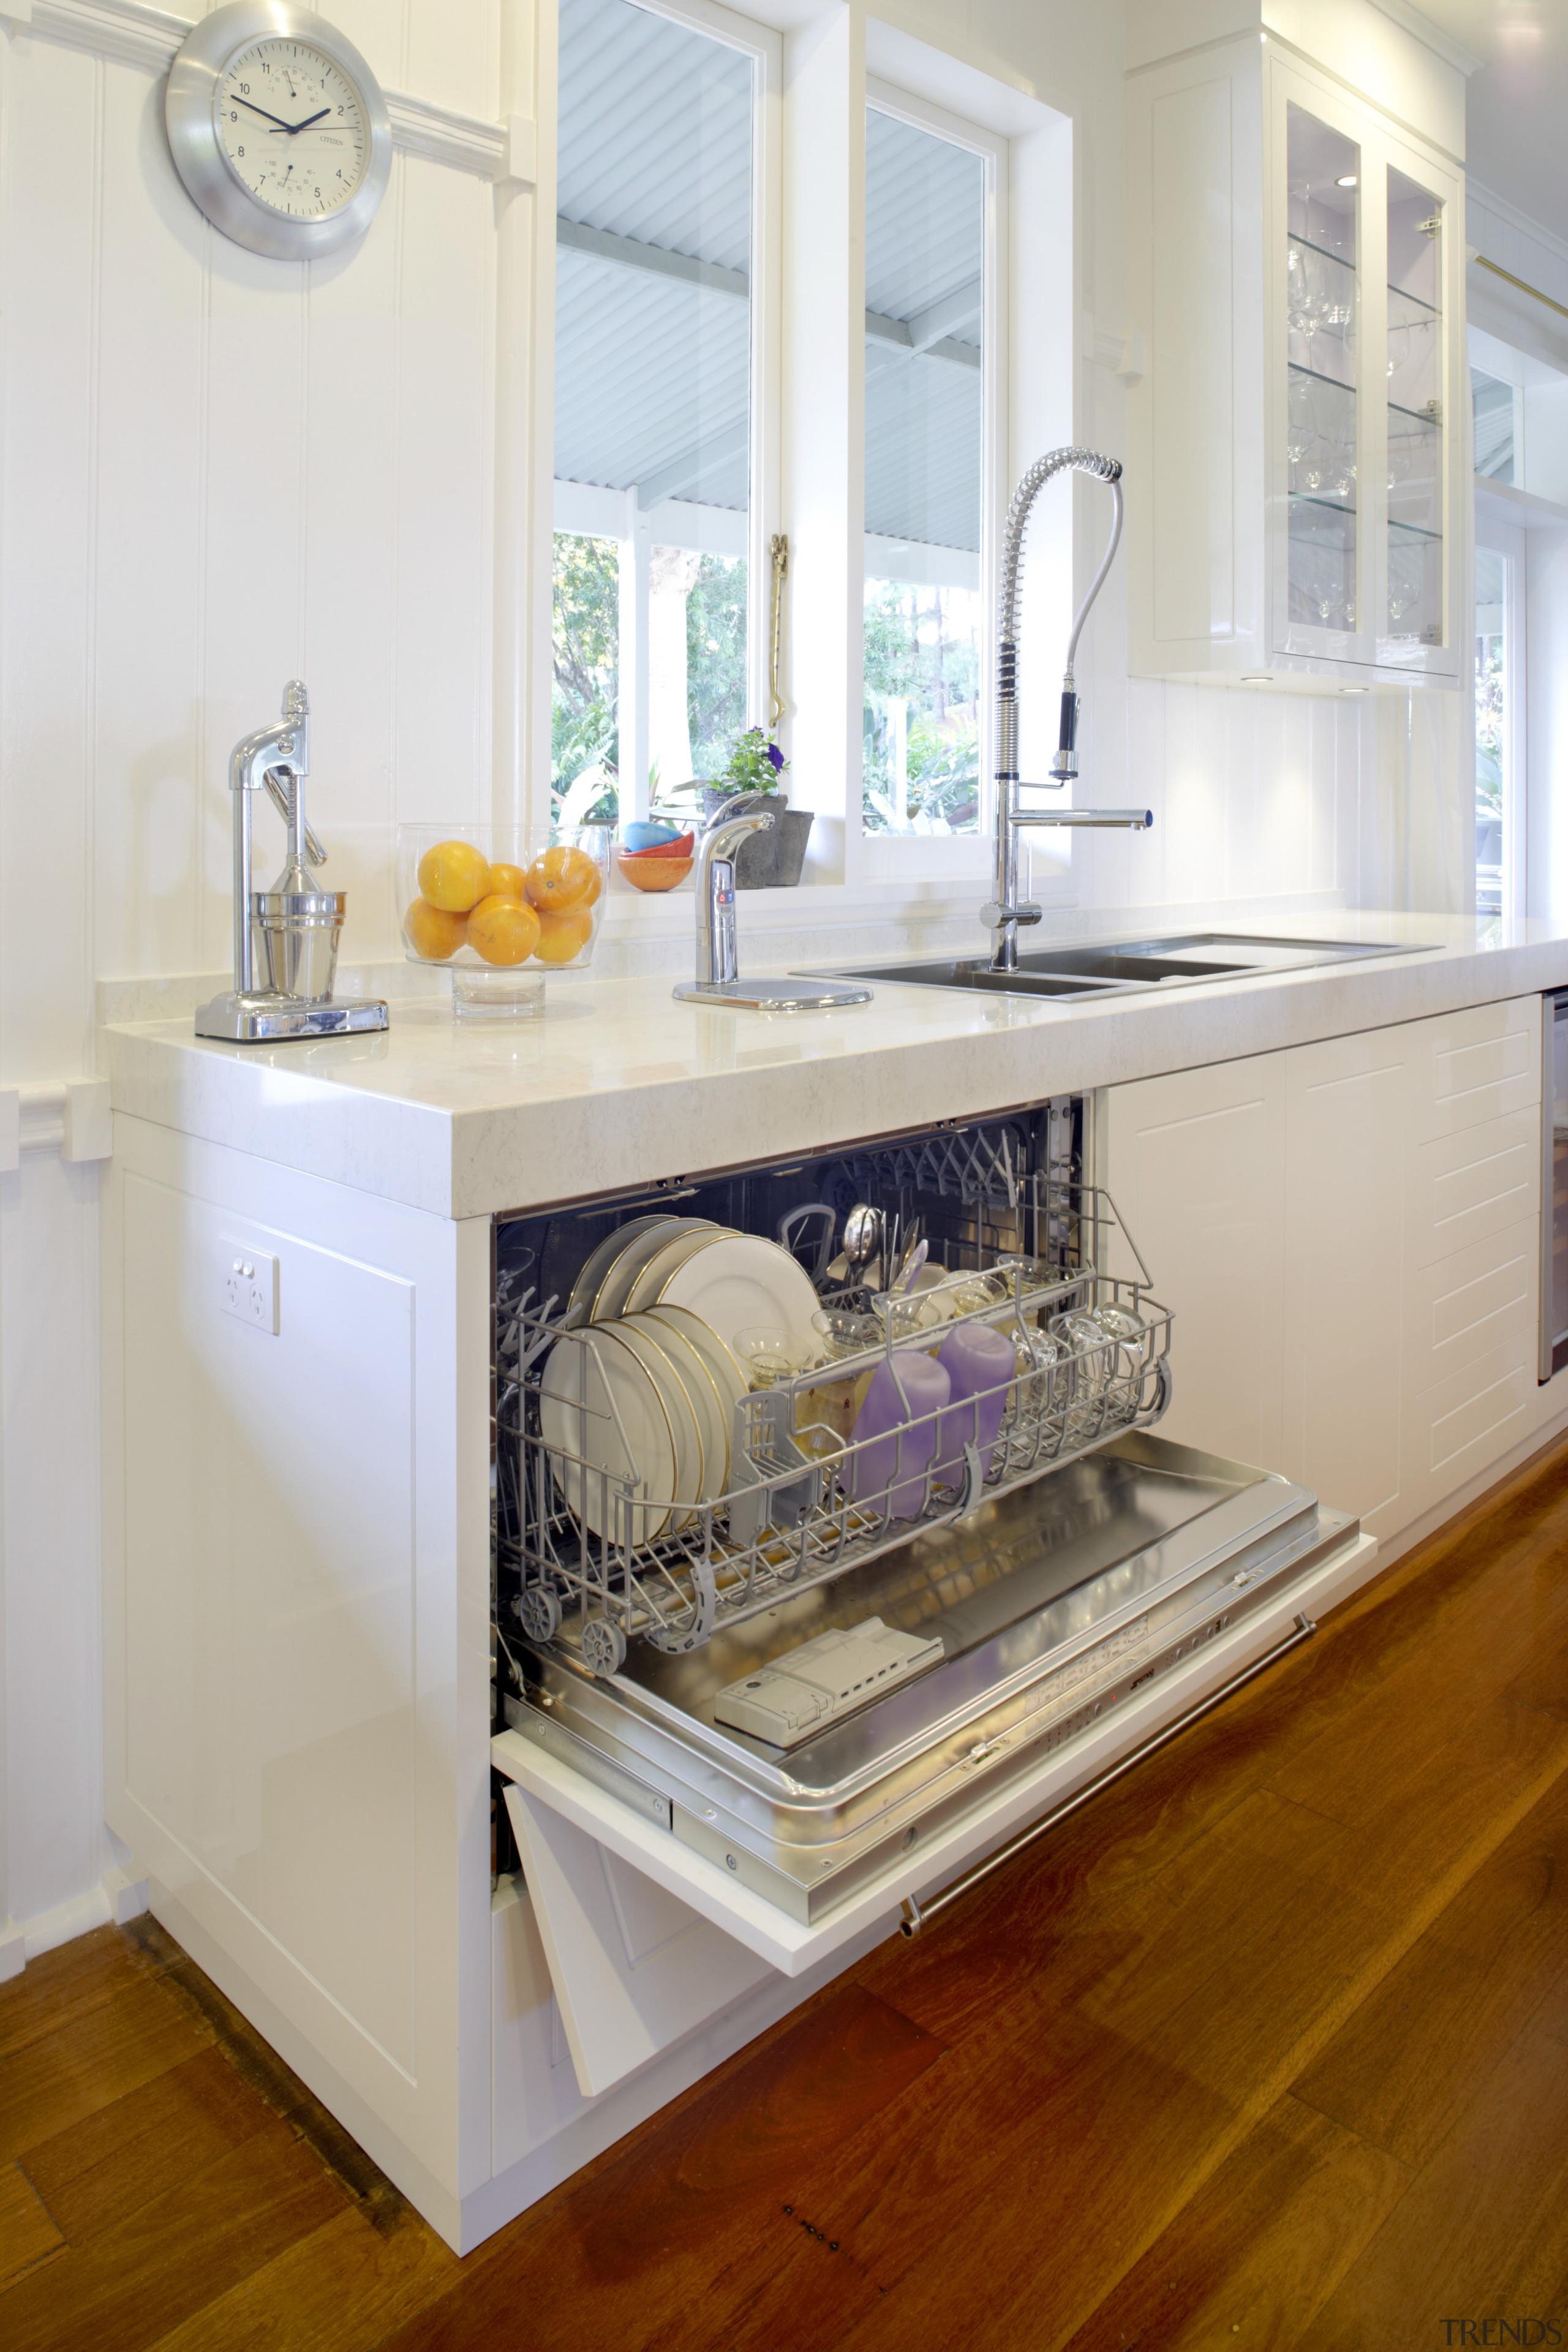 integrated dishwasher - integrated dishwasher - cabinetry   cabinetry, countertop, cuisine classique, furniture, home appliance, interior design, kitchen, room, table, gray